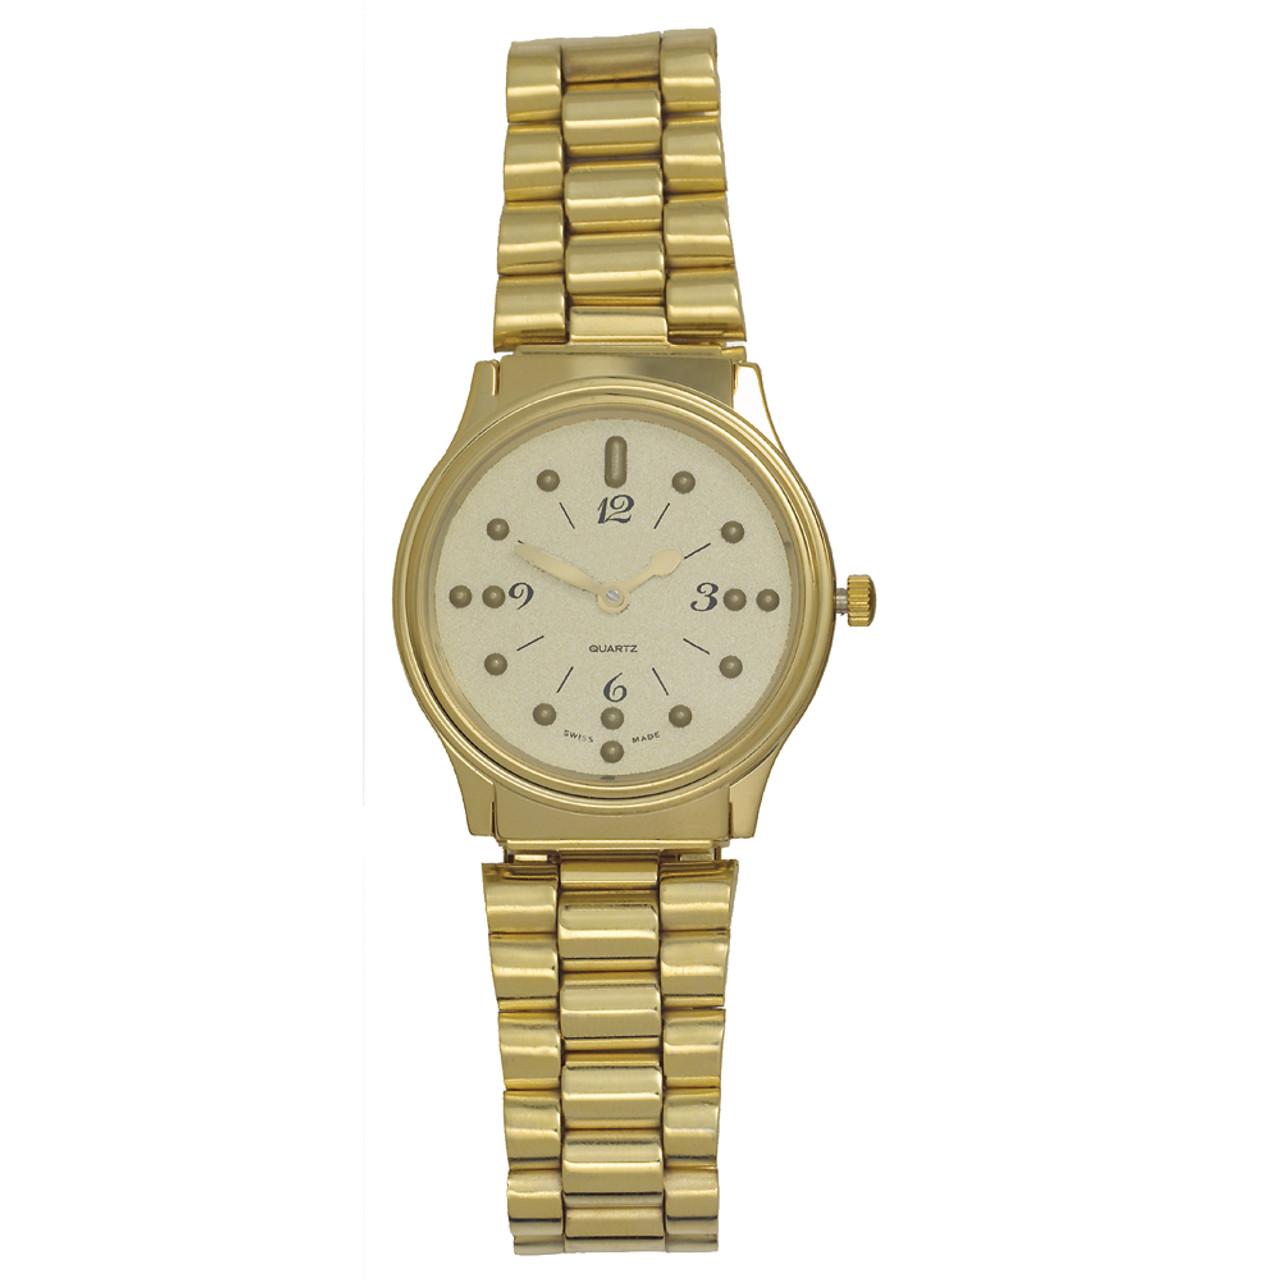 Men's Montiel Braille Watch Gold face, gold case, bracelet band